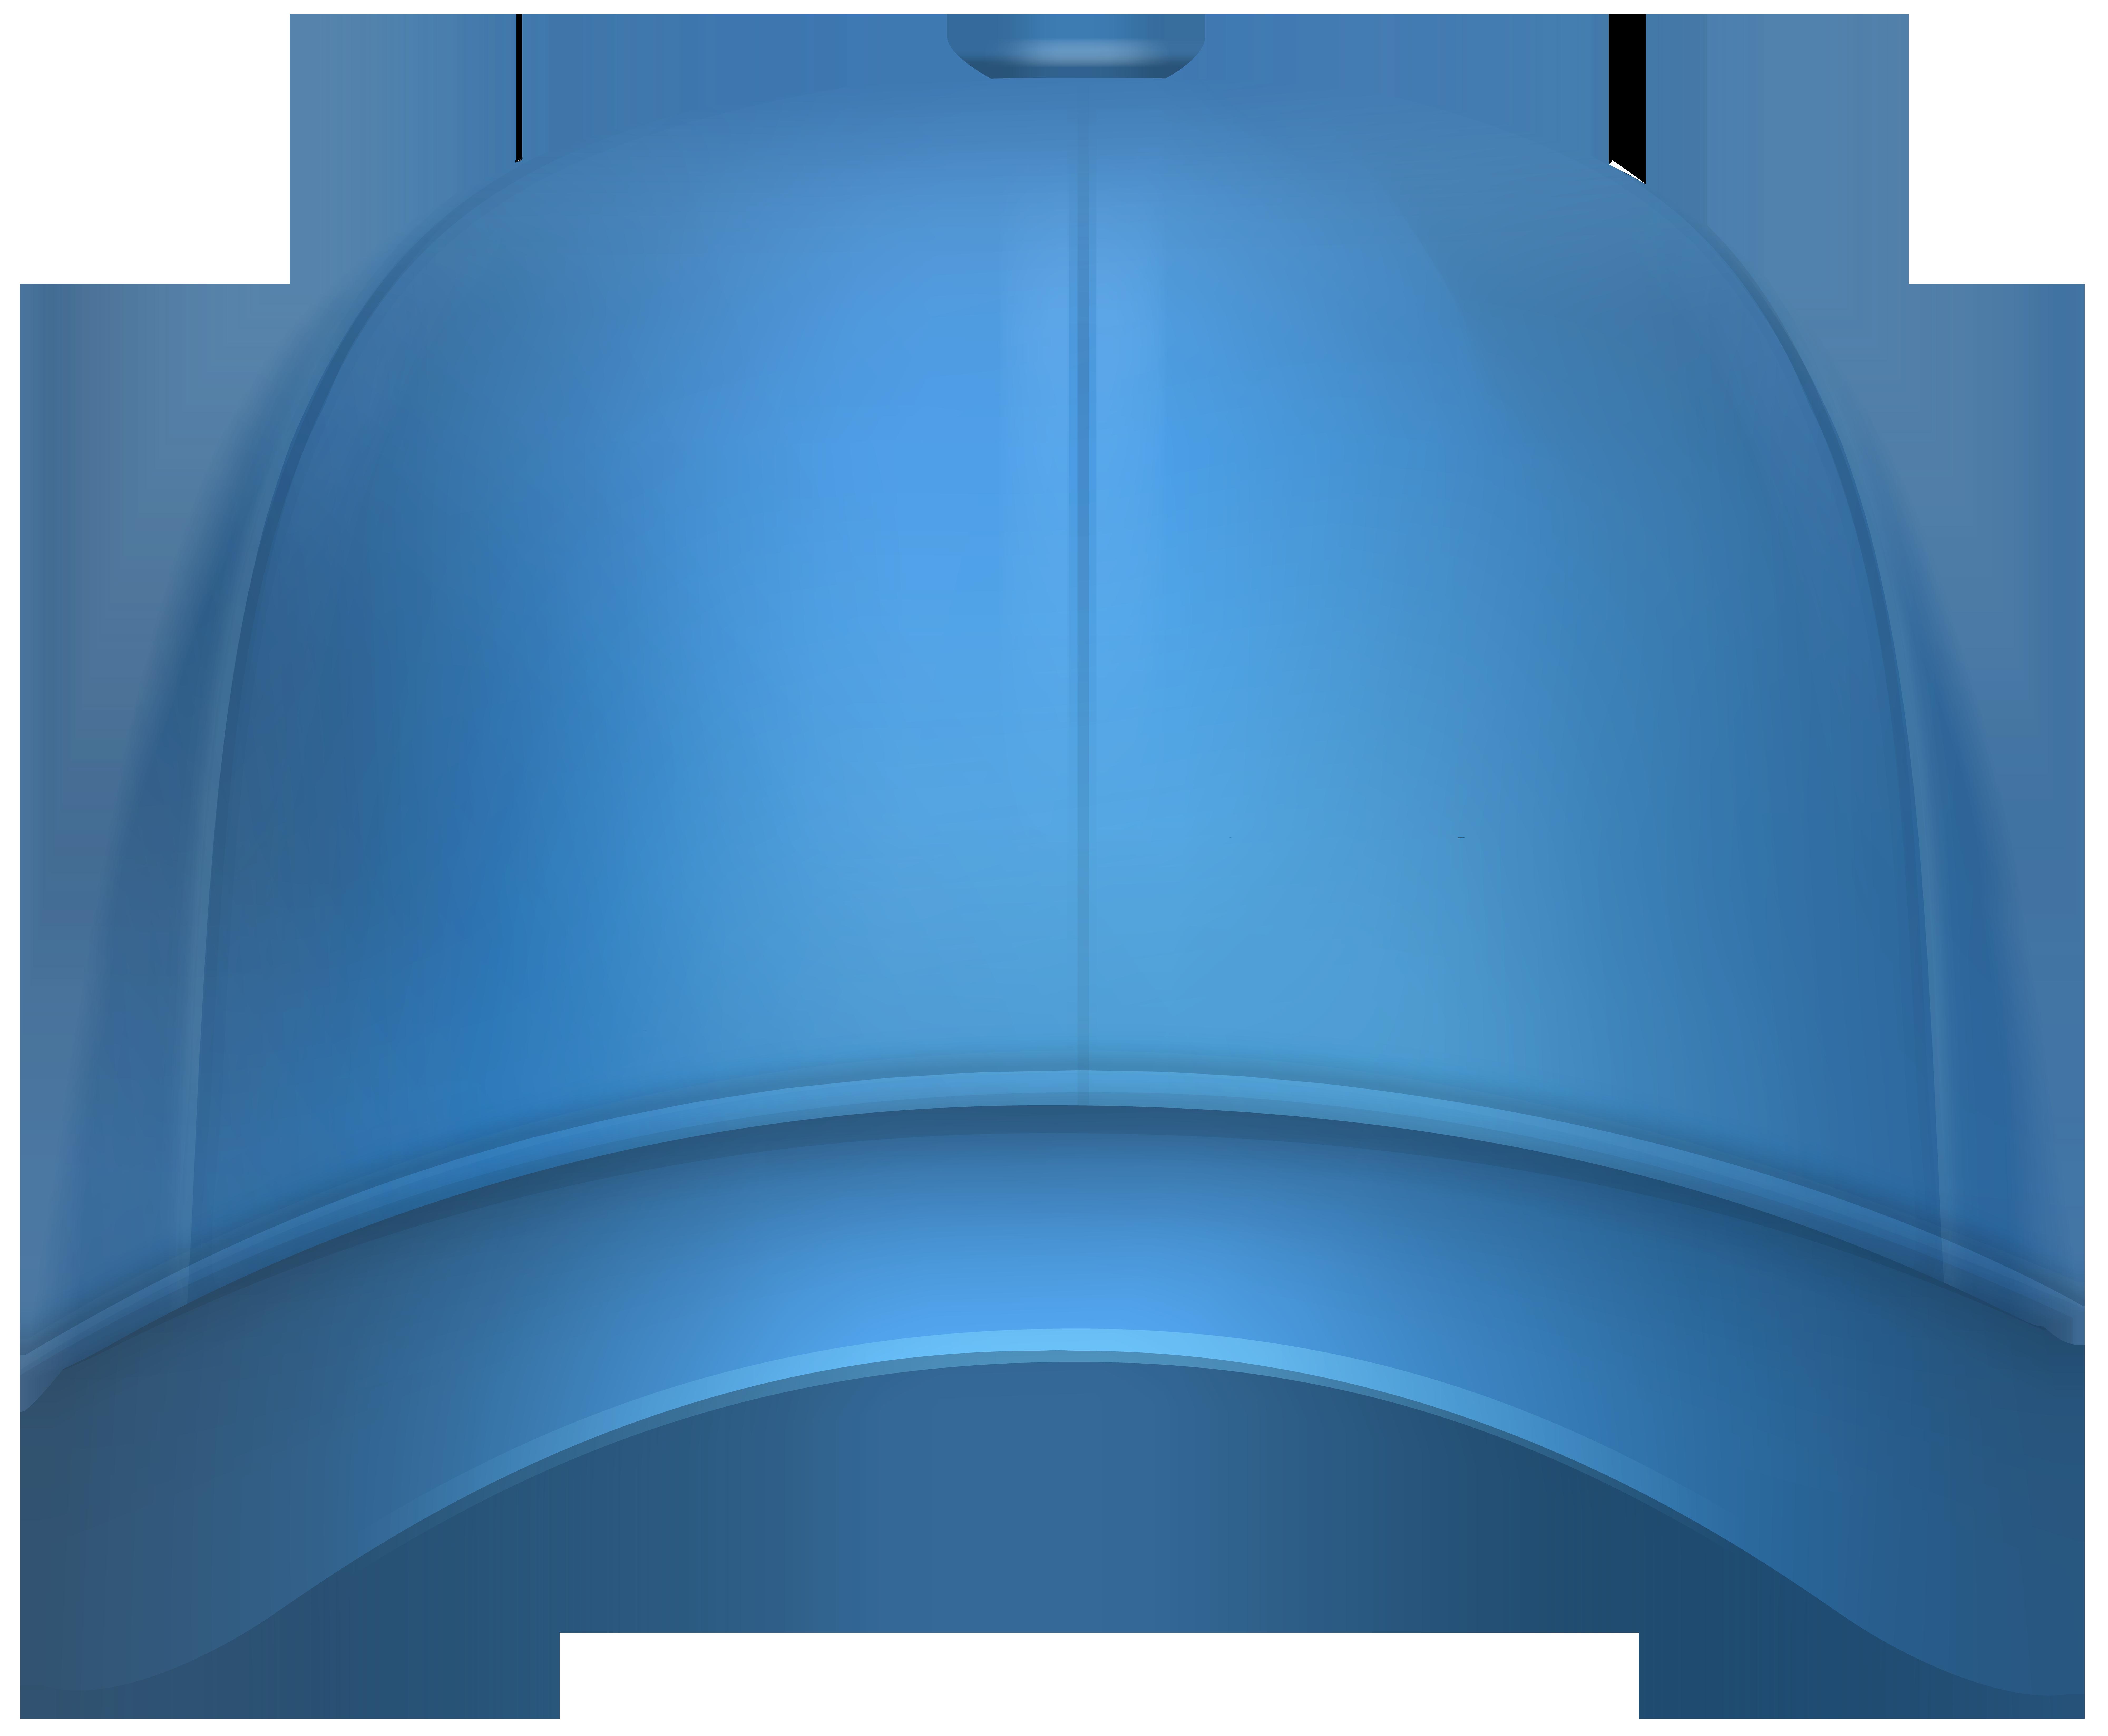 Backwards baseball cap clipart picture royalty free Baseball Cap Clipart Free & Baseball Cap Clip Art Free Images #4391 ... picture royalty free